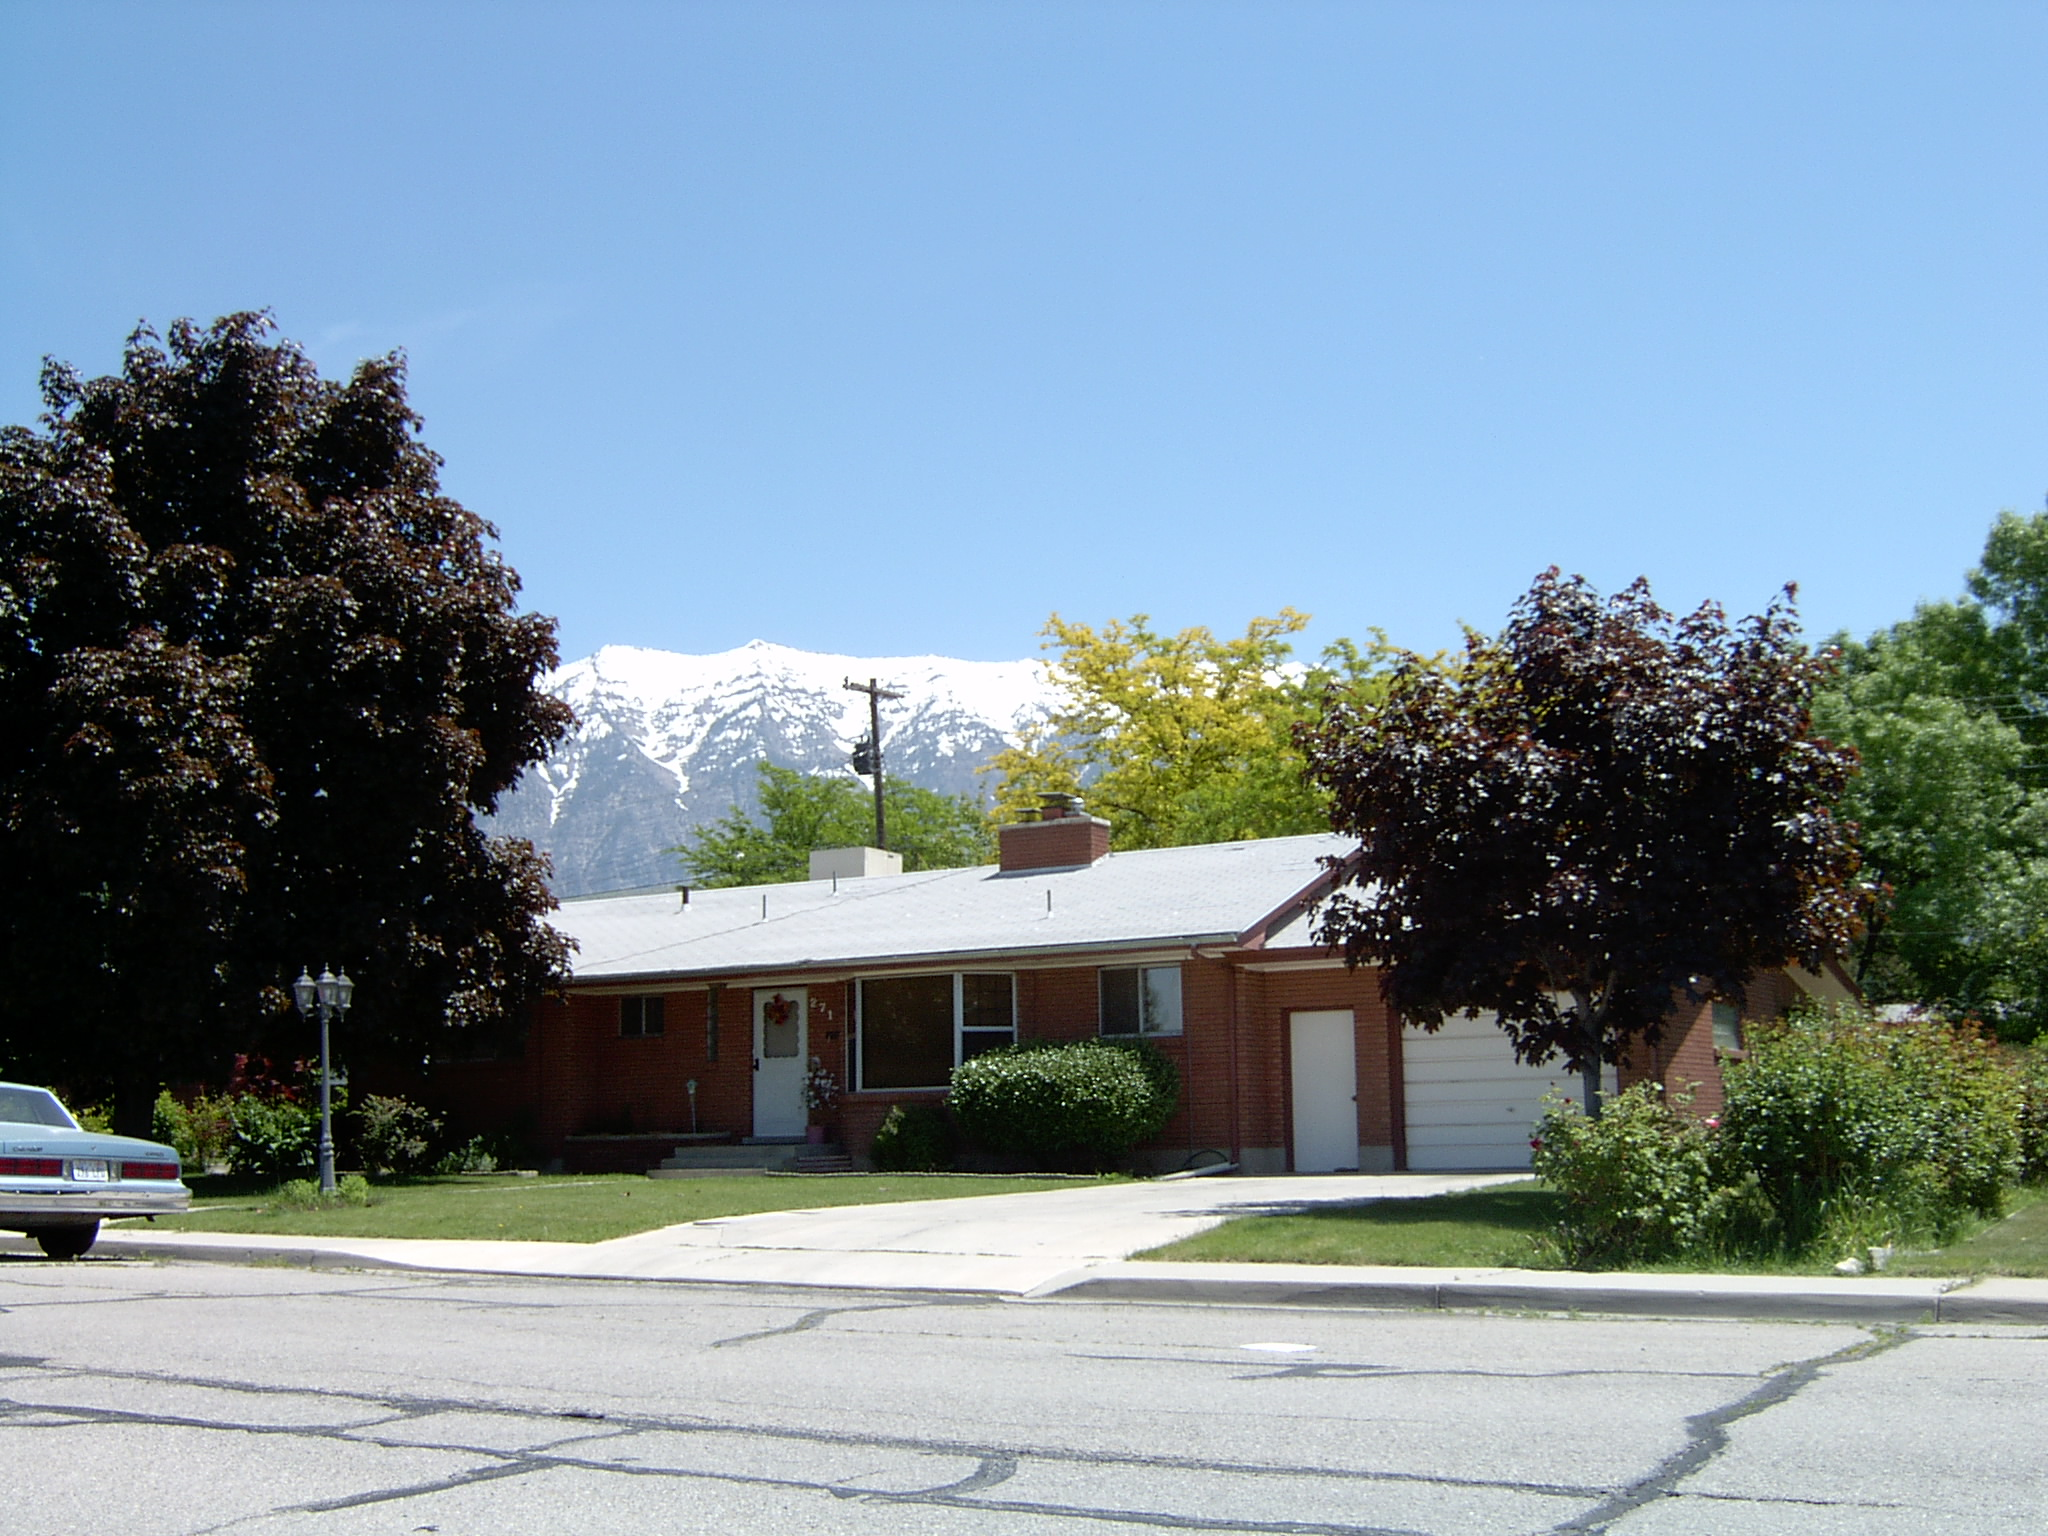 2005-1548P.JPG